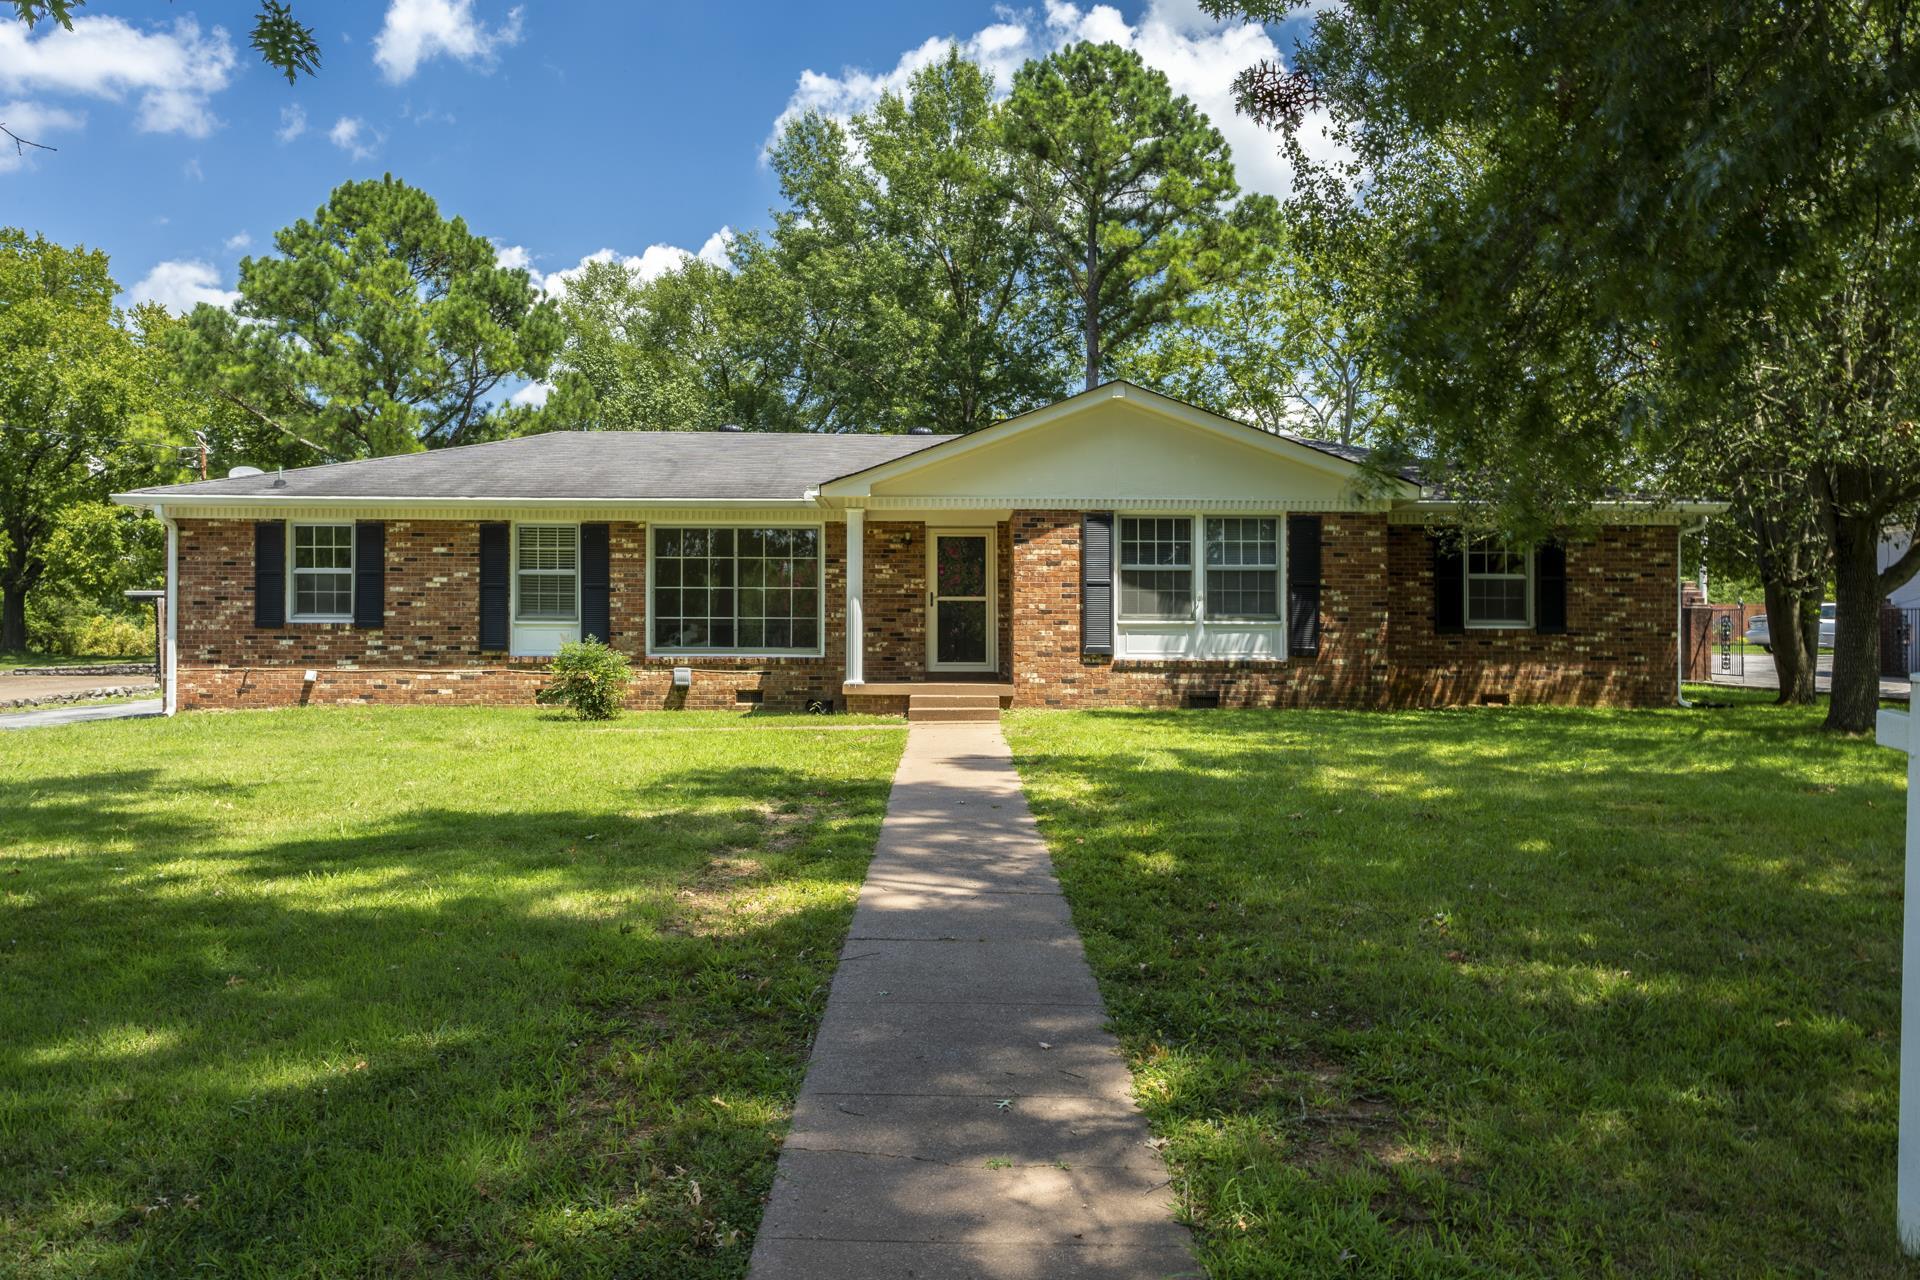 219 Oak Hill Dr, Lebanon, TN 37087 - Lebanon, TN real estate listing